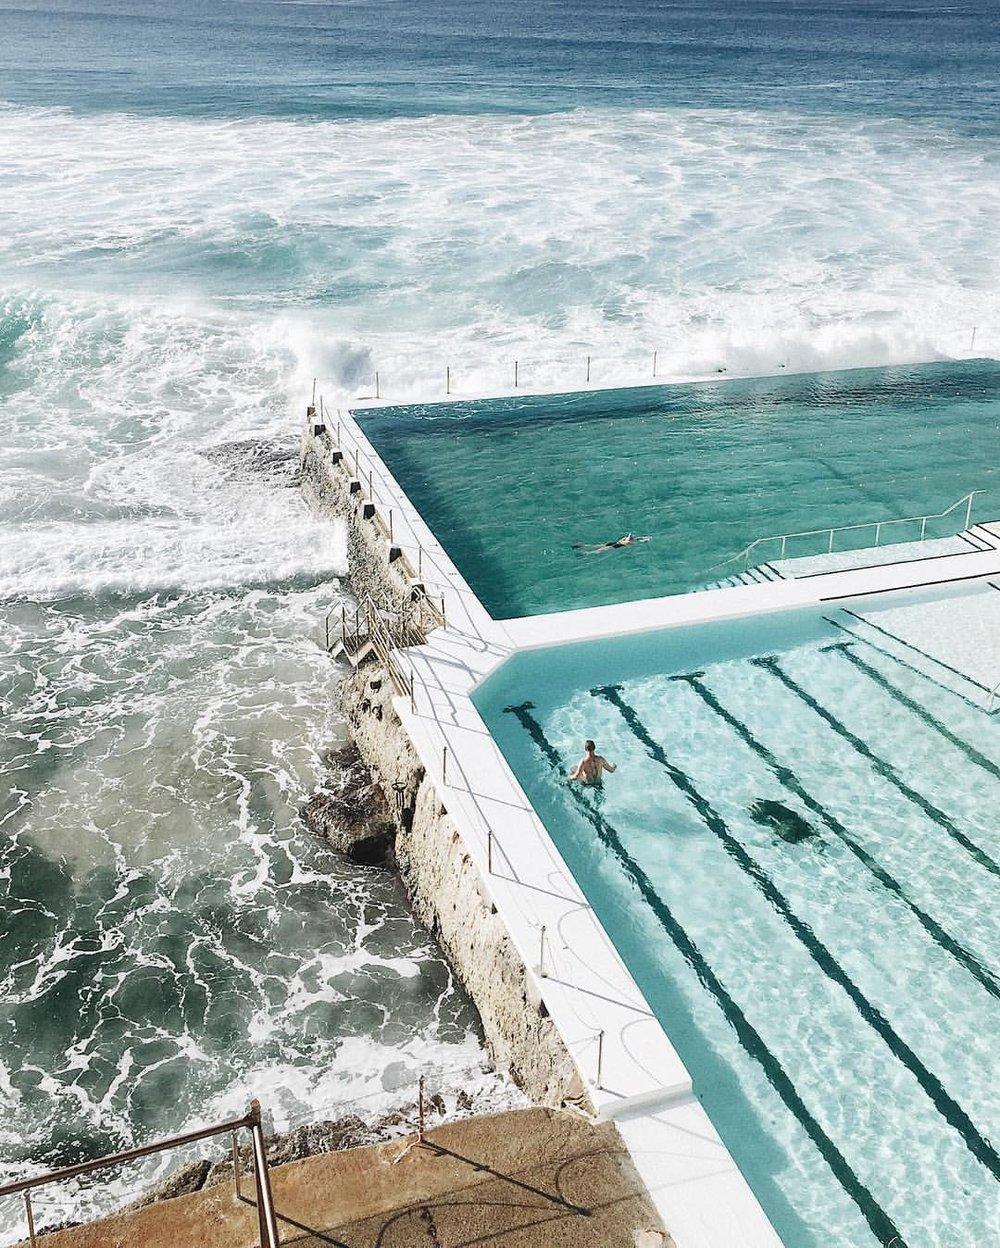 ❤️️ 143 likes     twosixswim    icebergs. 📸 @colbymilano // #twosixswim